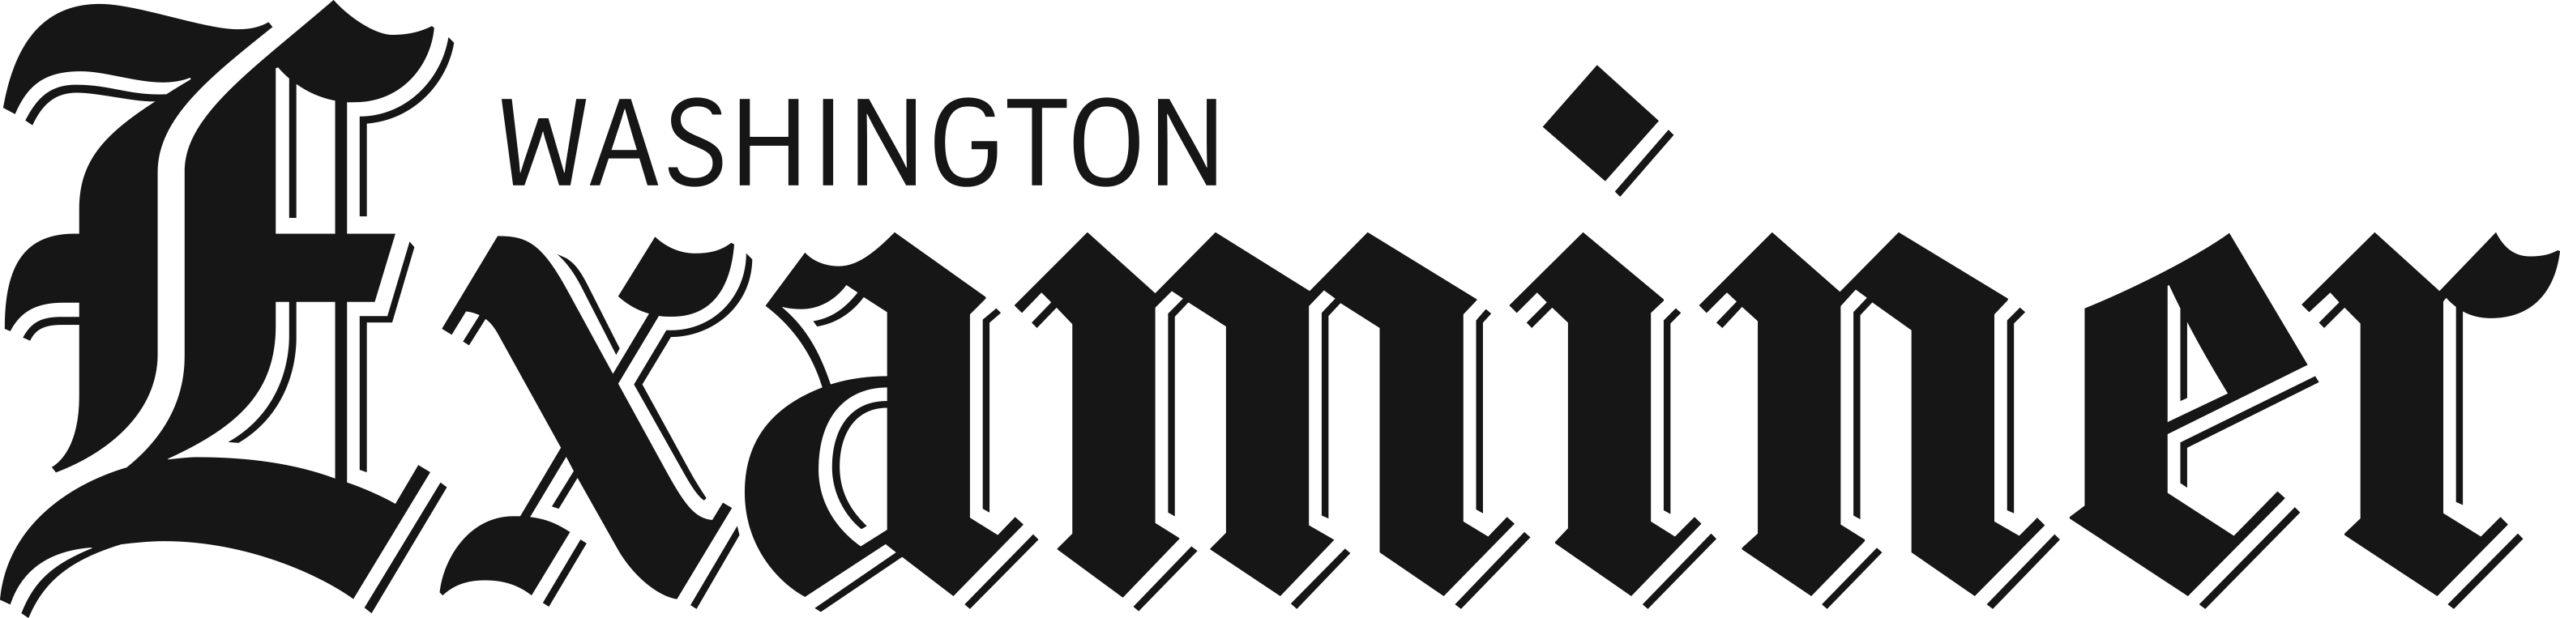 Washington Examiner - Logo